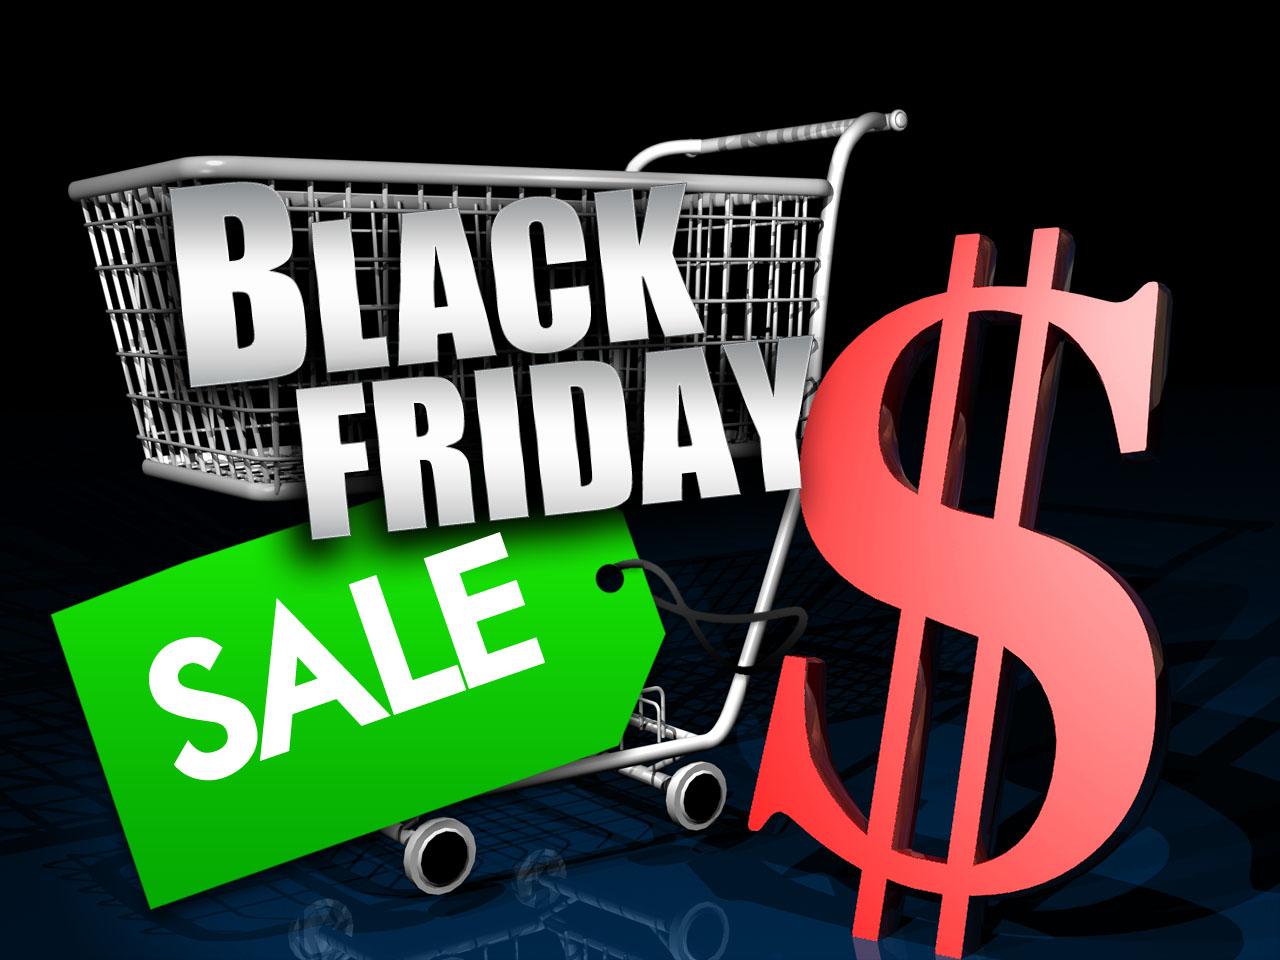 Black Friday Happy Holiday S And Happy Shopping